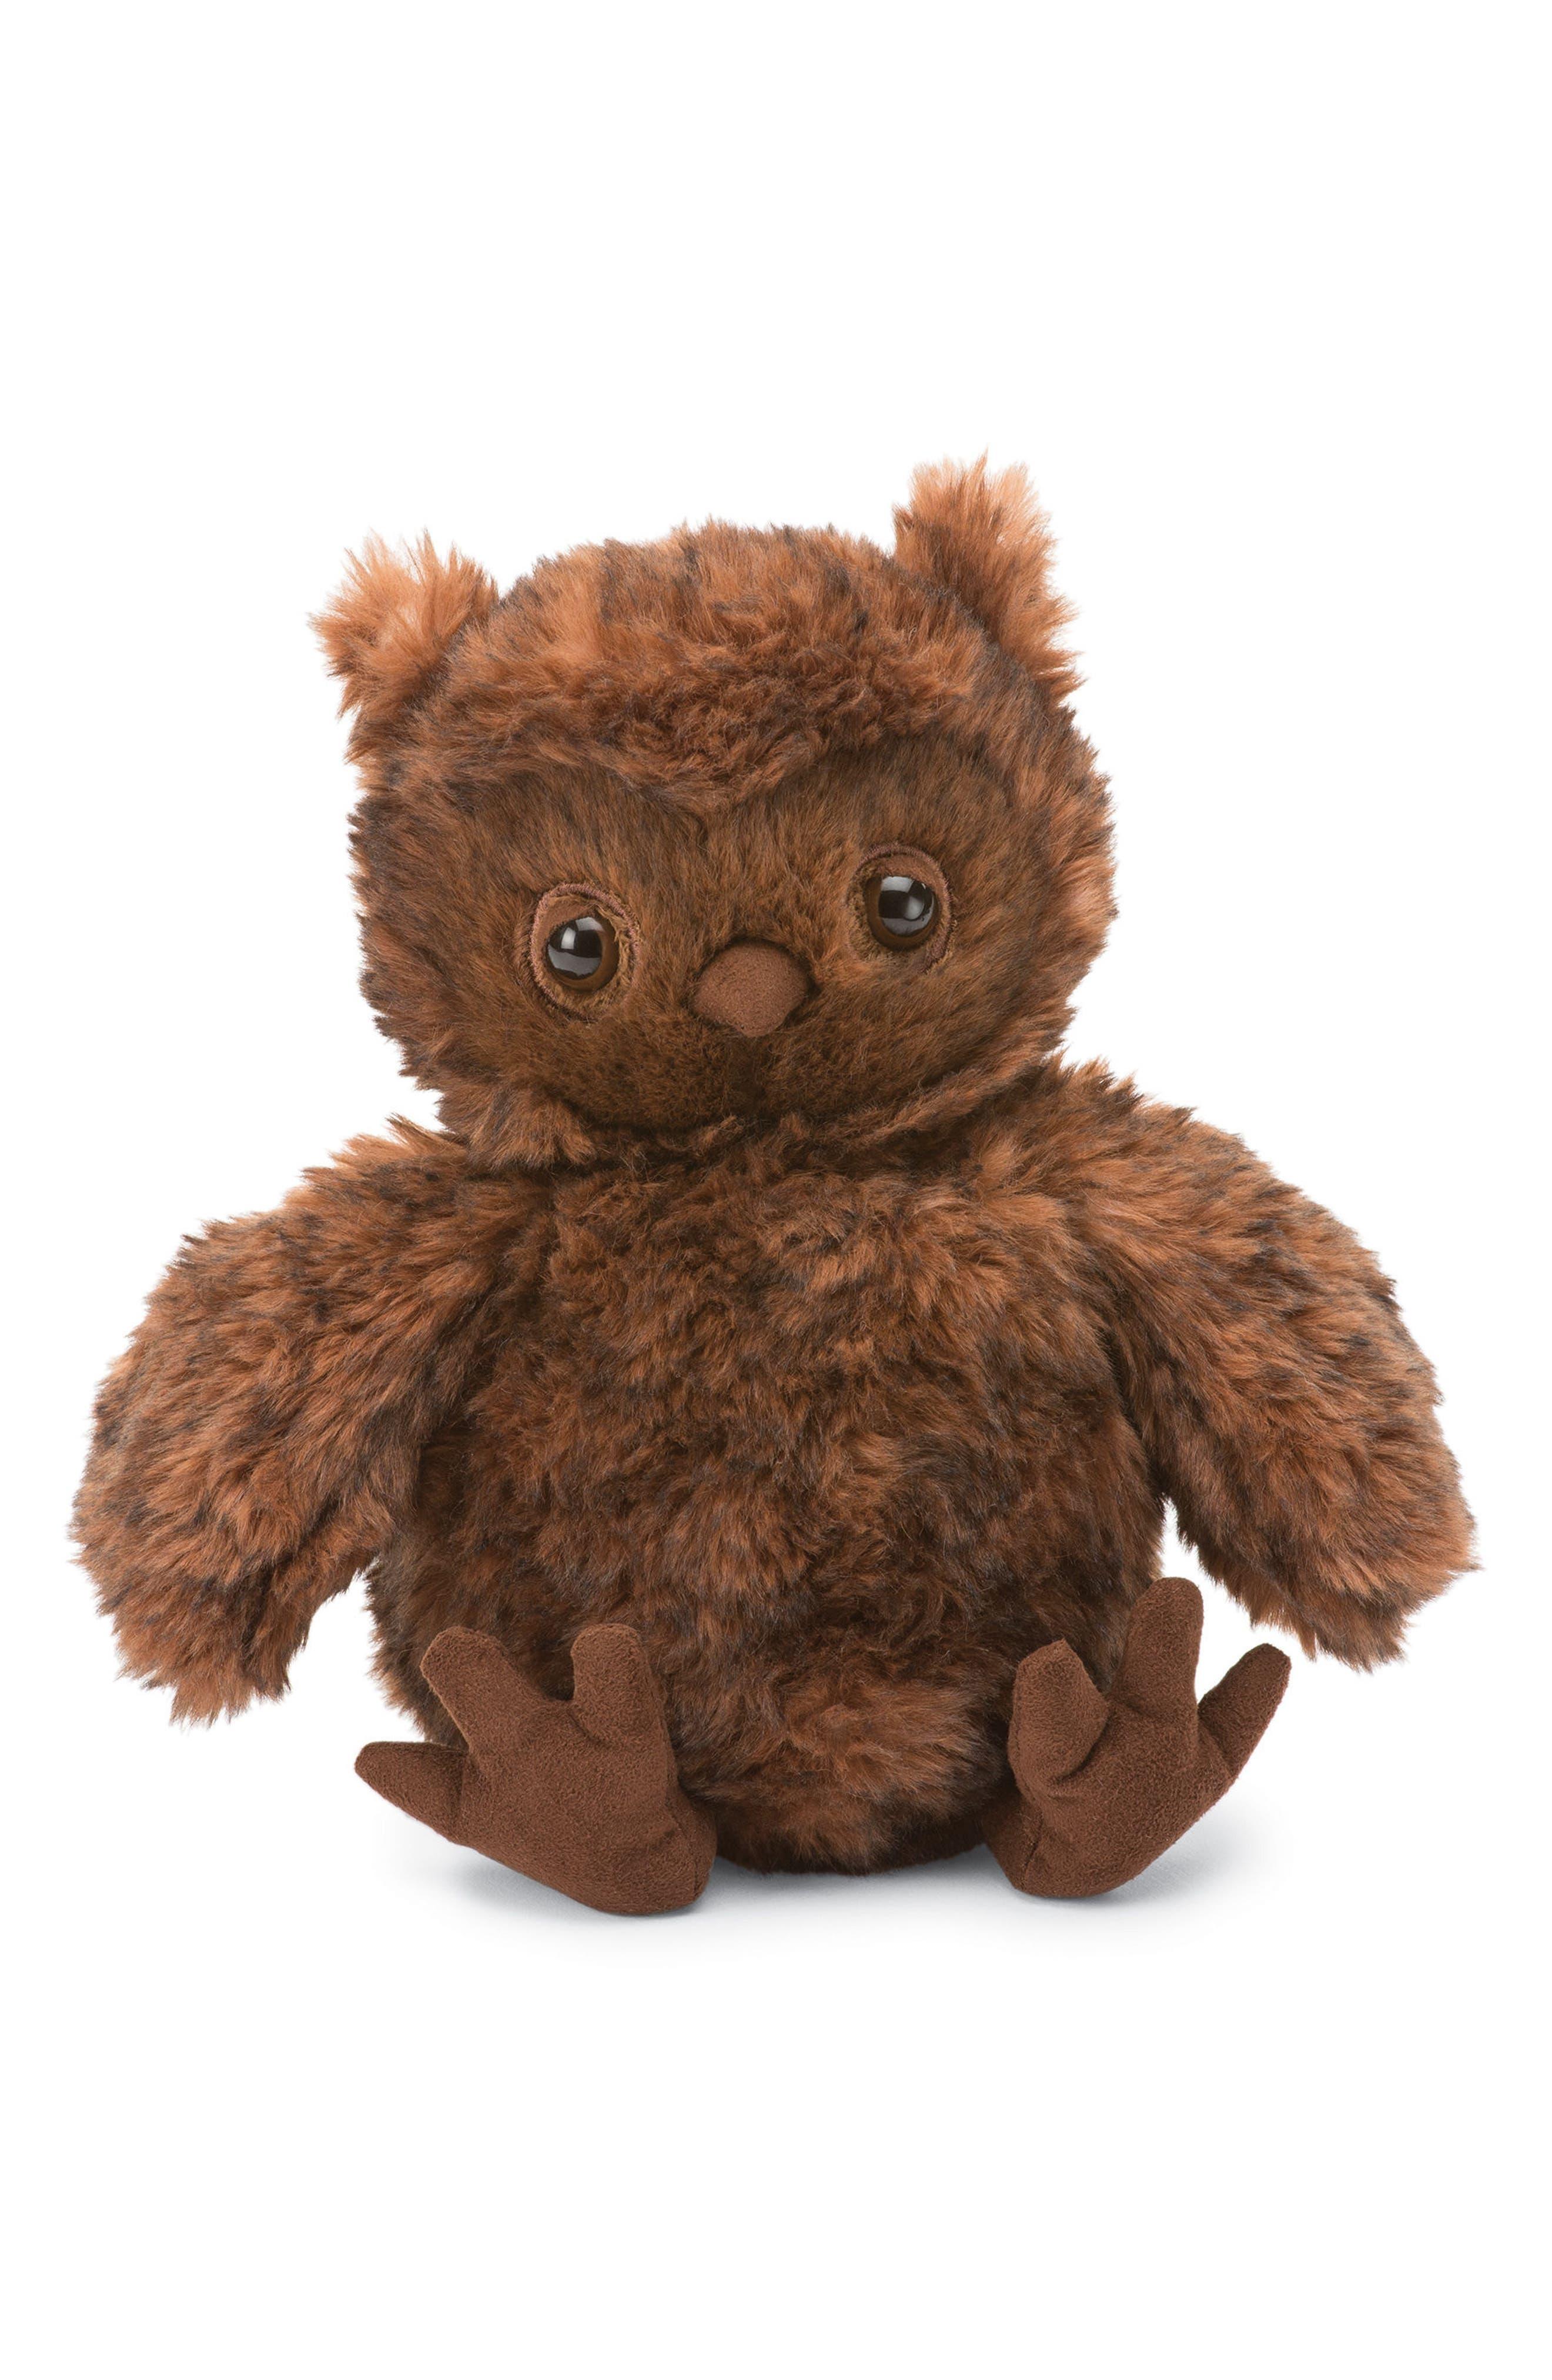 Cornelius the Owl Stuffed Animal,                             Main thumbnail 1, color,                             Brown